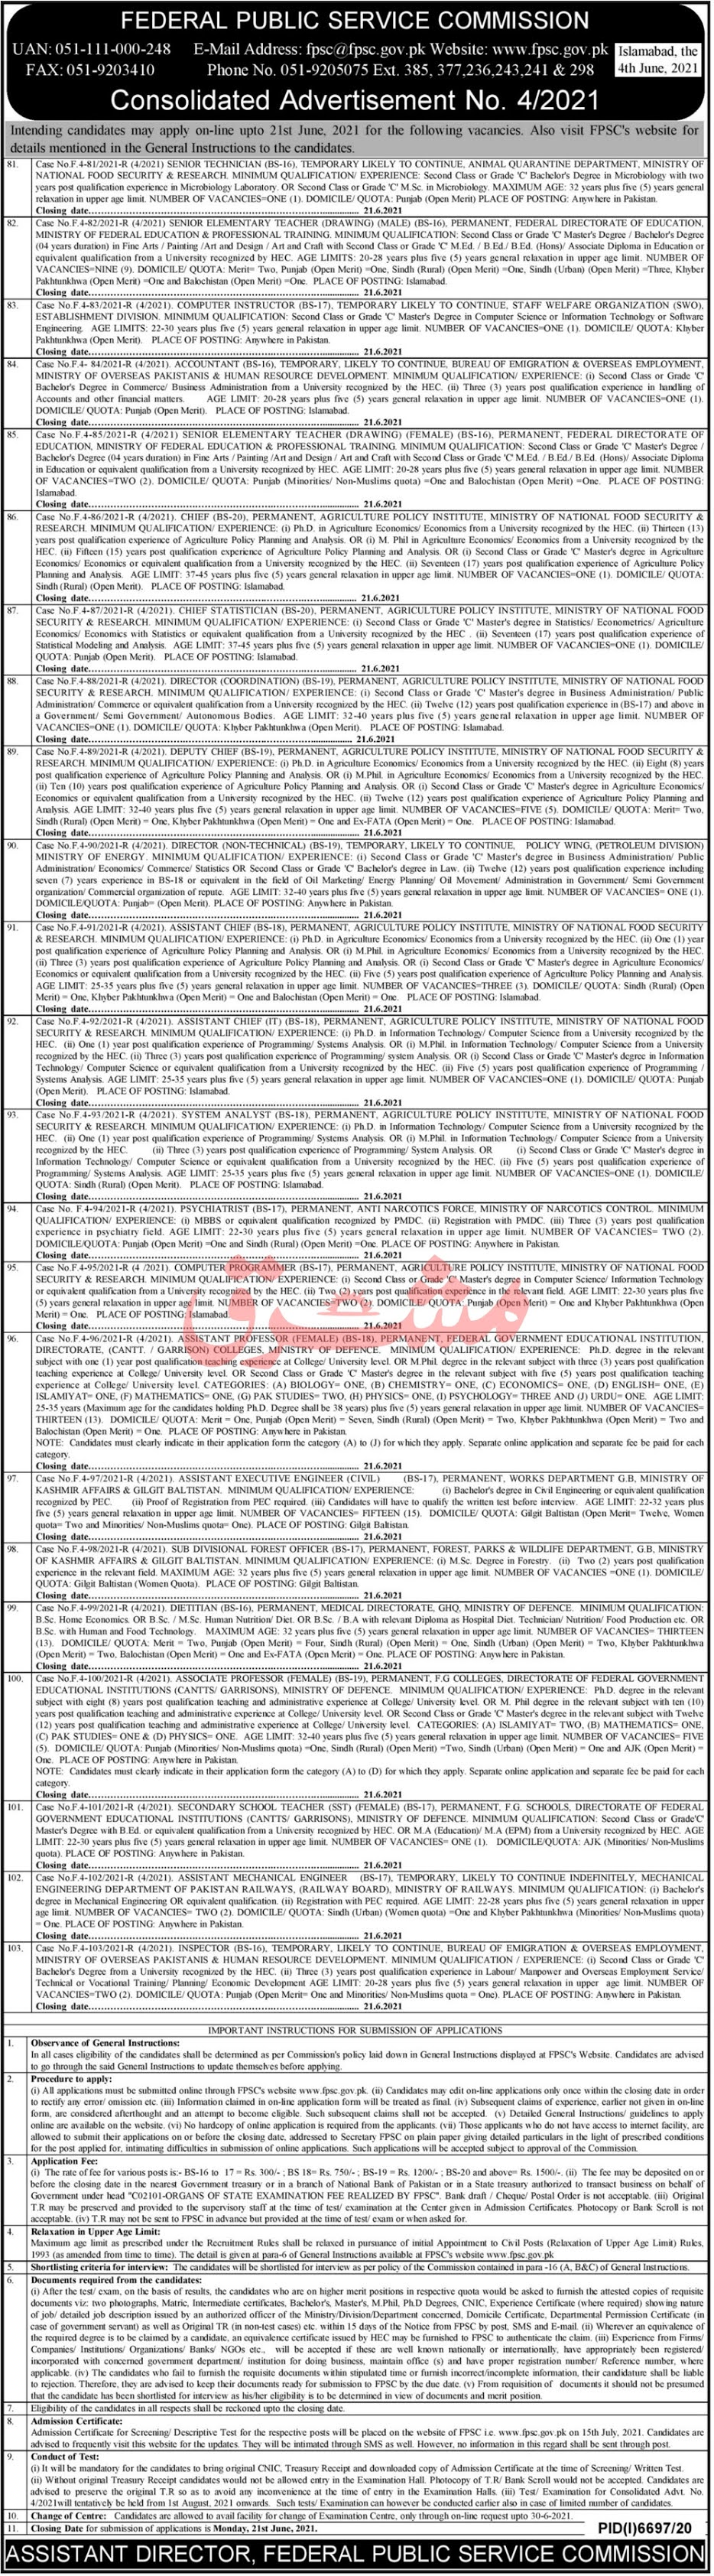 www.fpsc.gov.pk Jobs 2021 - Federal Public Service Commission (FPSC) Jobs 2021 in Pakistan